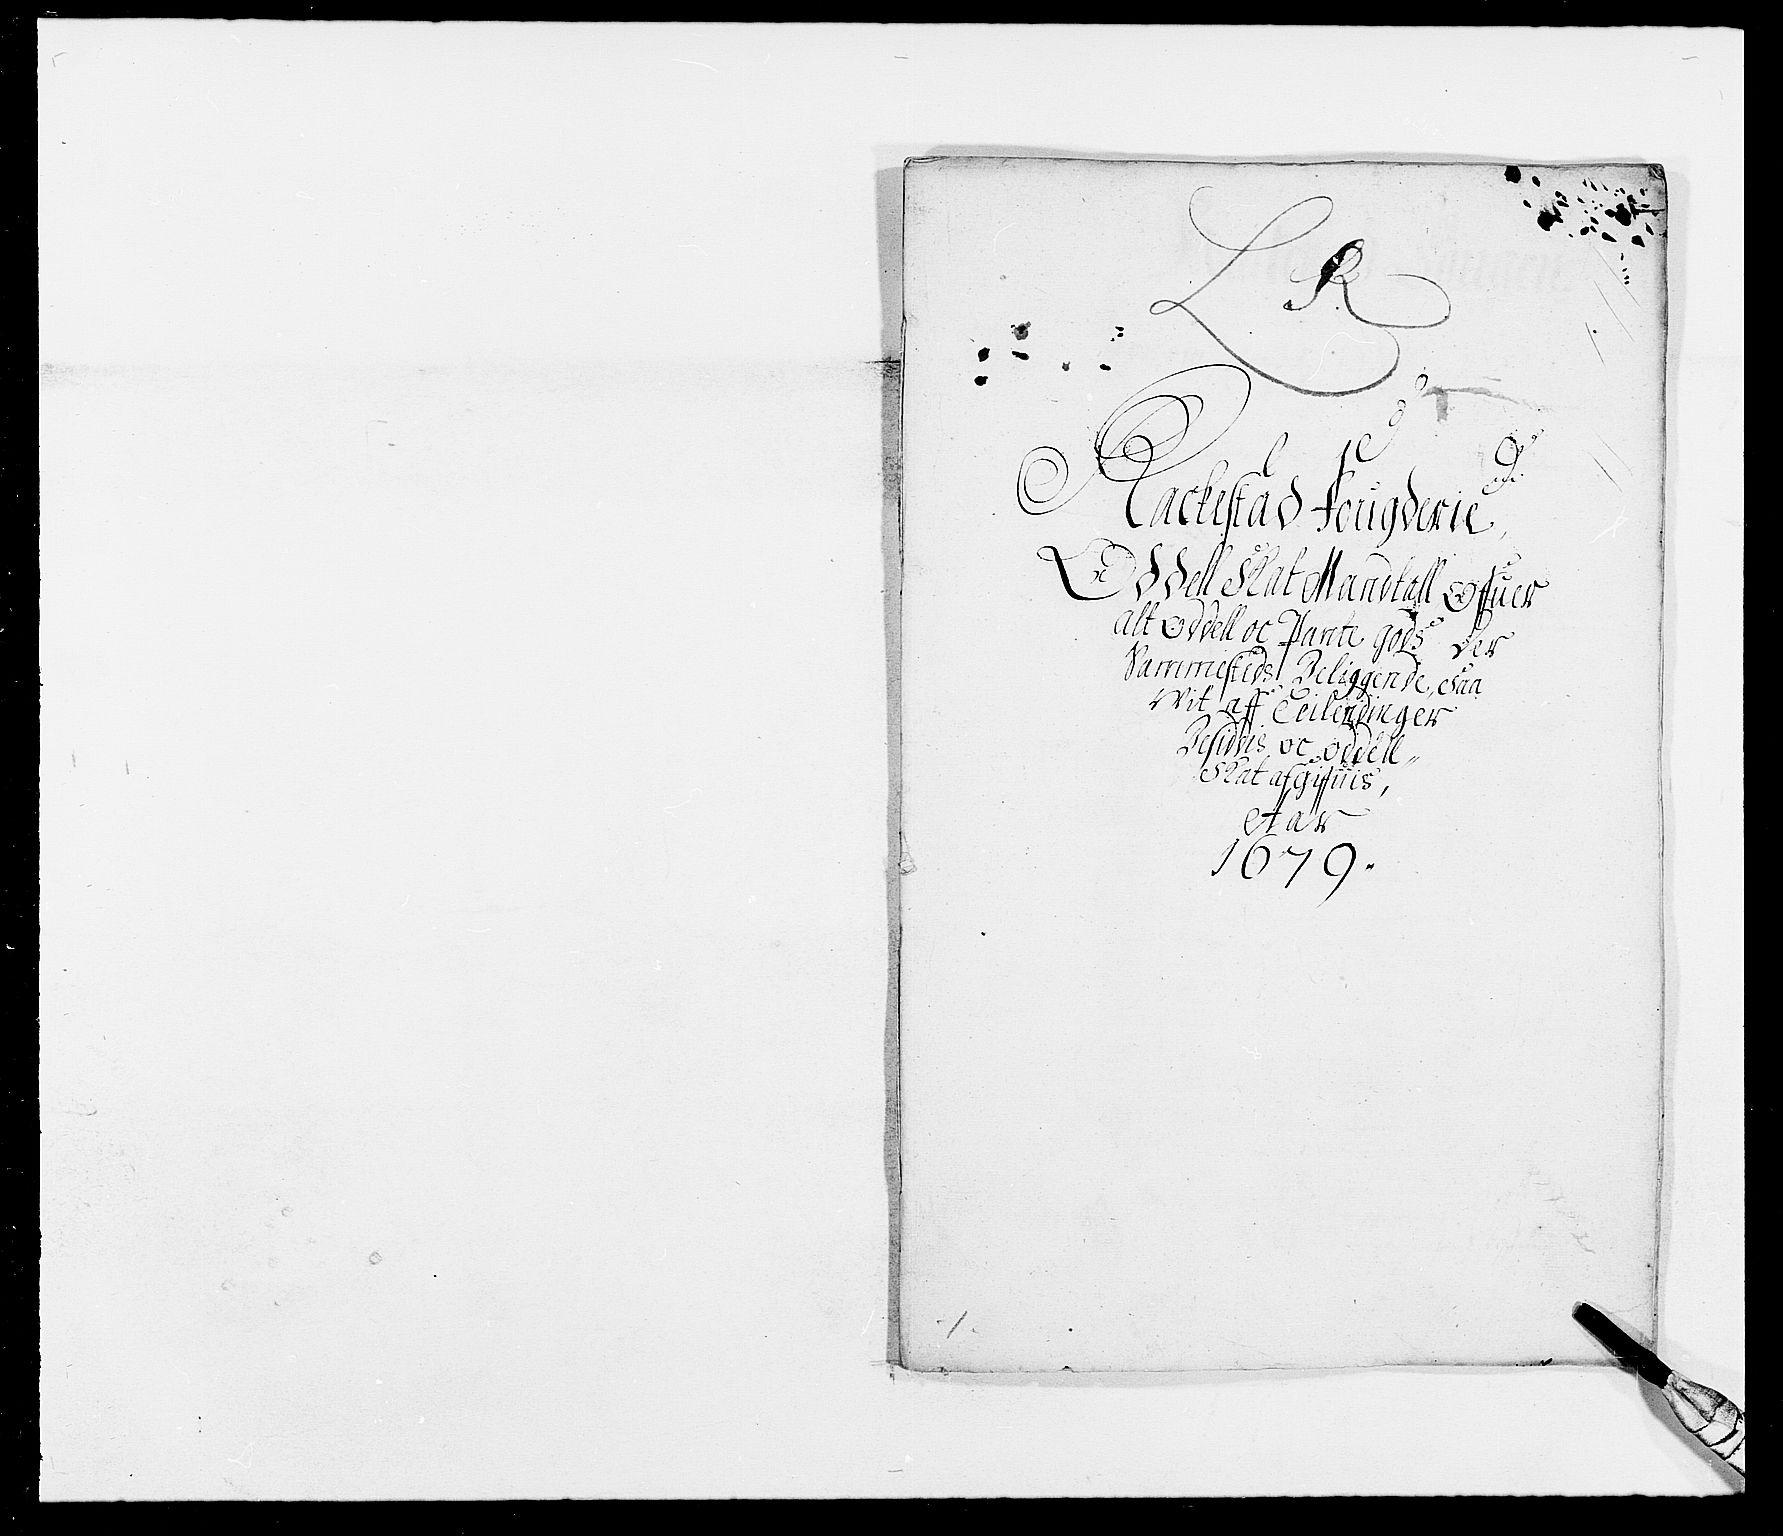 RA, Rentekammeret inntil 1814, Reviderte regnskaper, Fogderegnskap, R05/L0271: Fogderegnskap Rakkestad, 1678-1679, s. 390